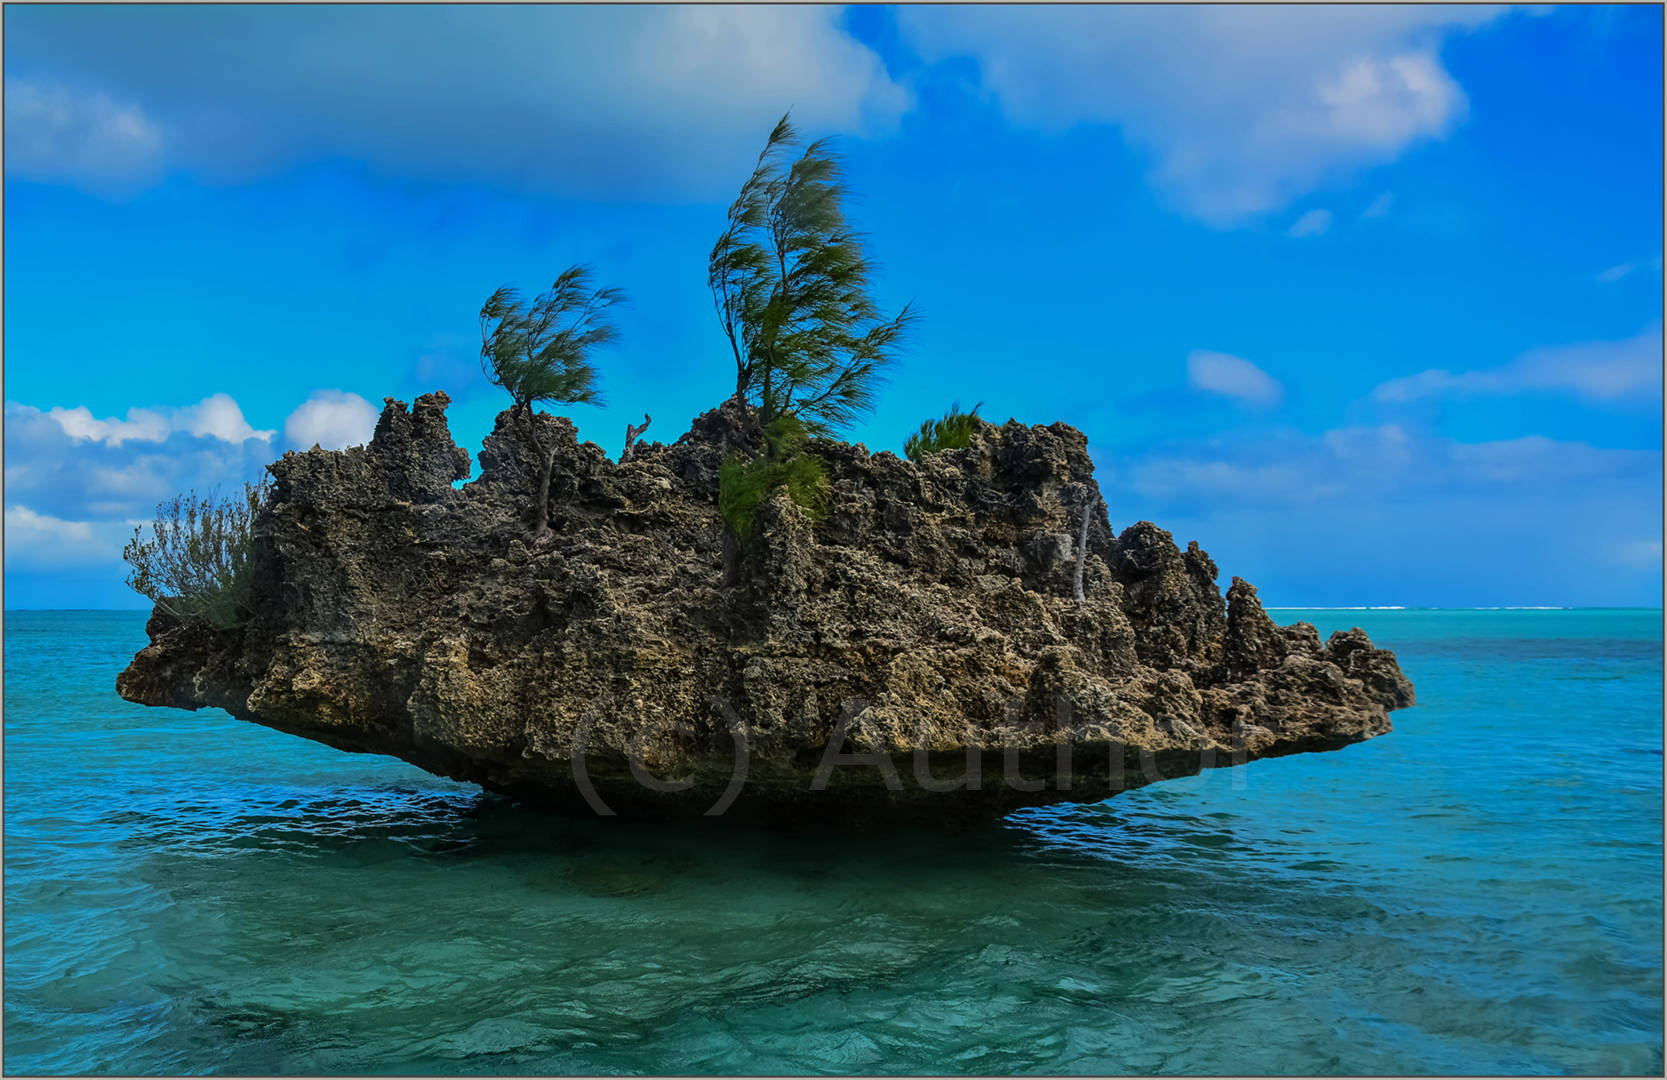 3_pi_Crystal Rock Mauritius_c_Brian Kleinwort